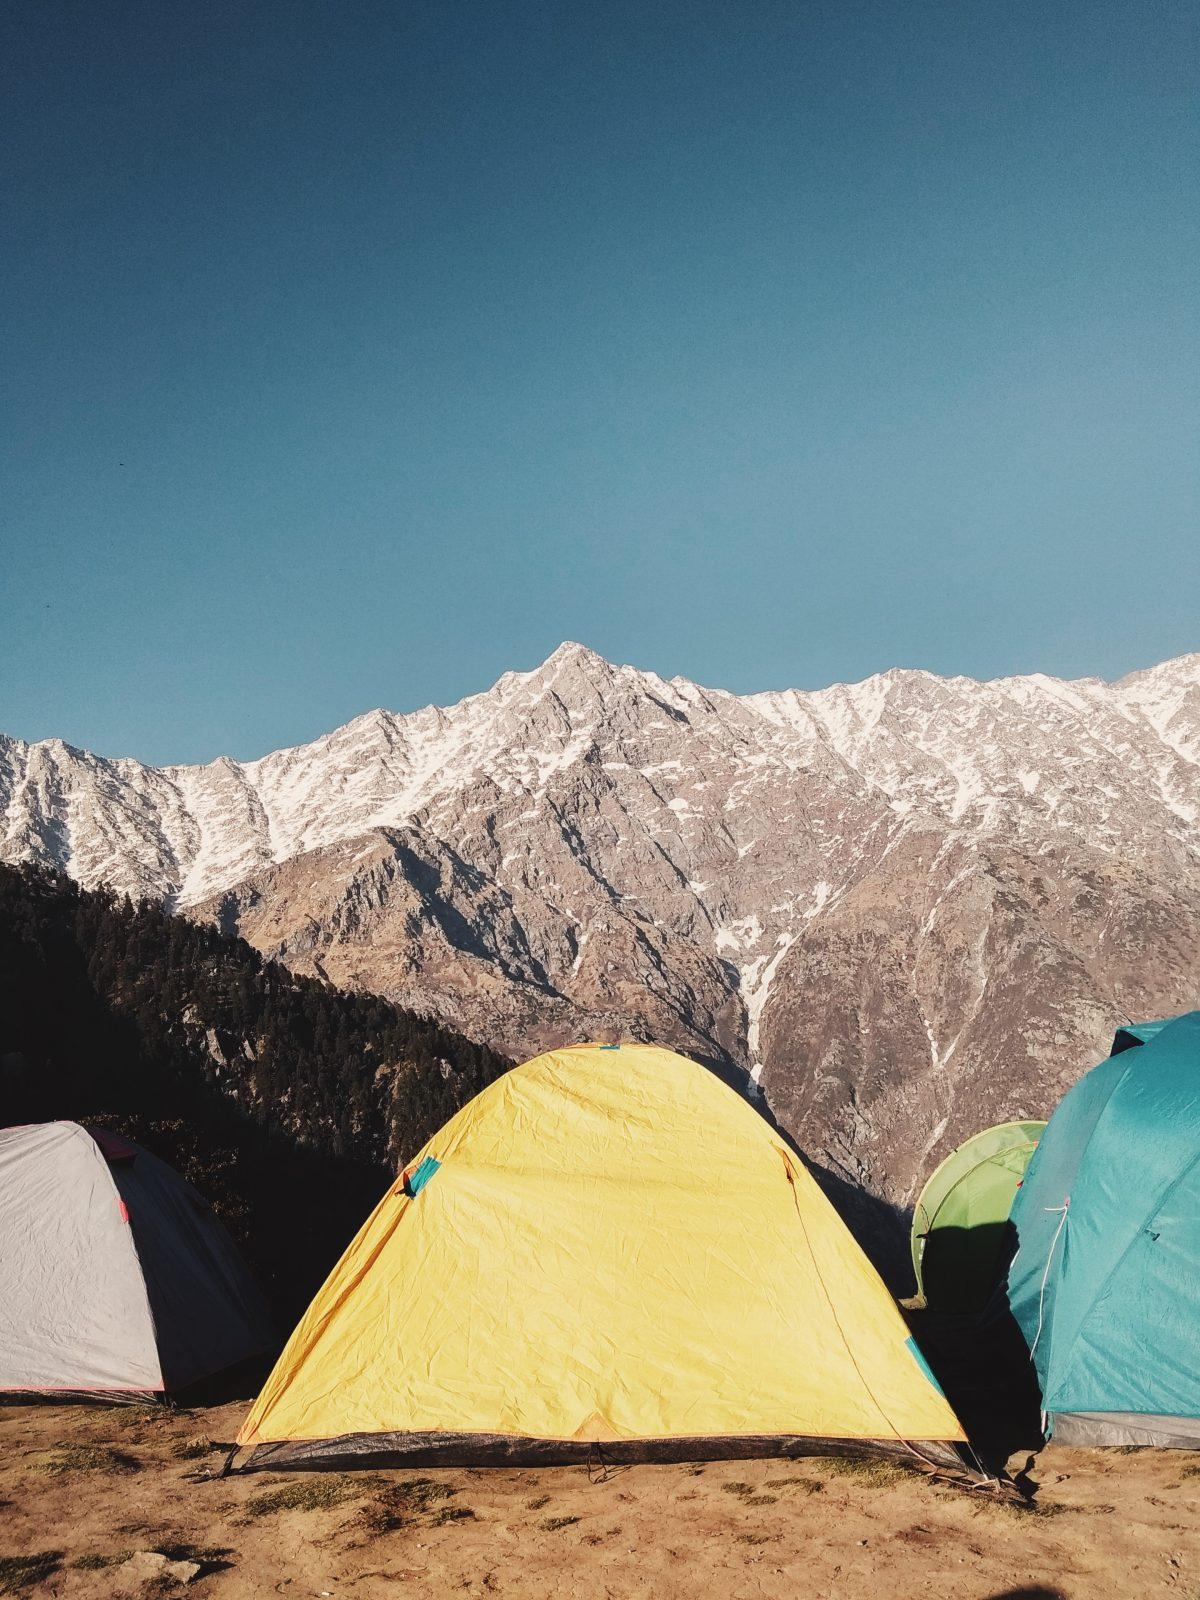 Yellow pop up tent